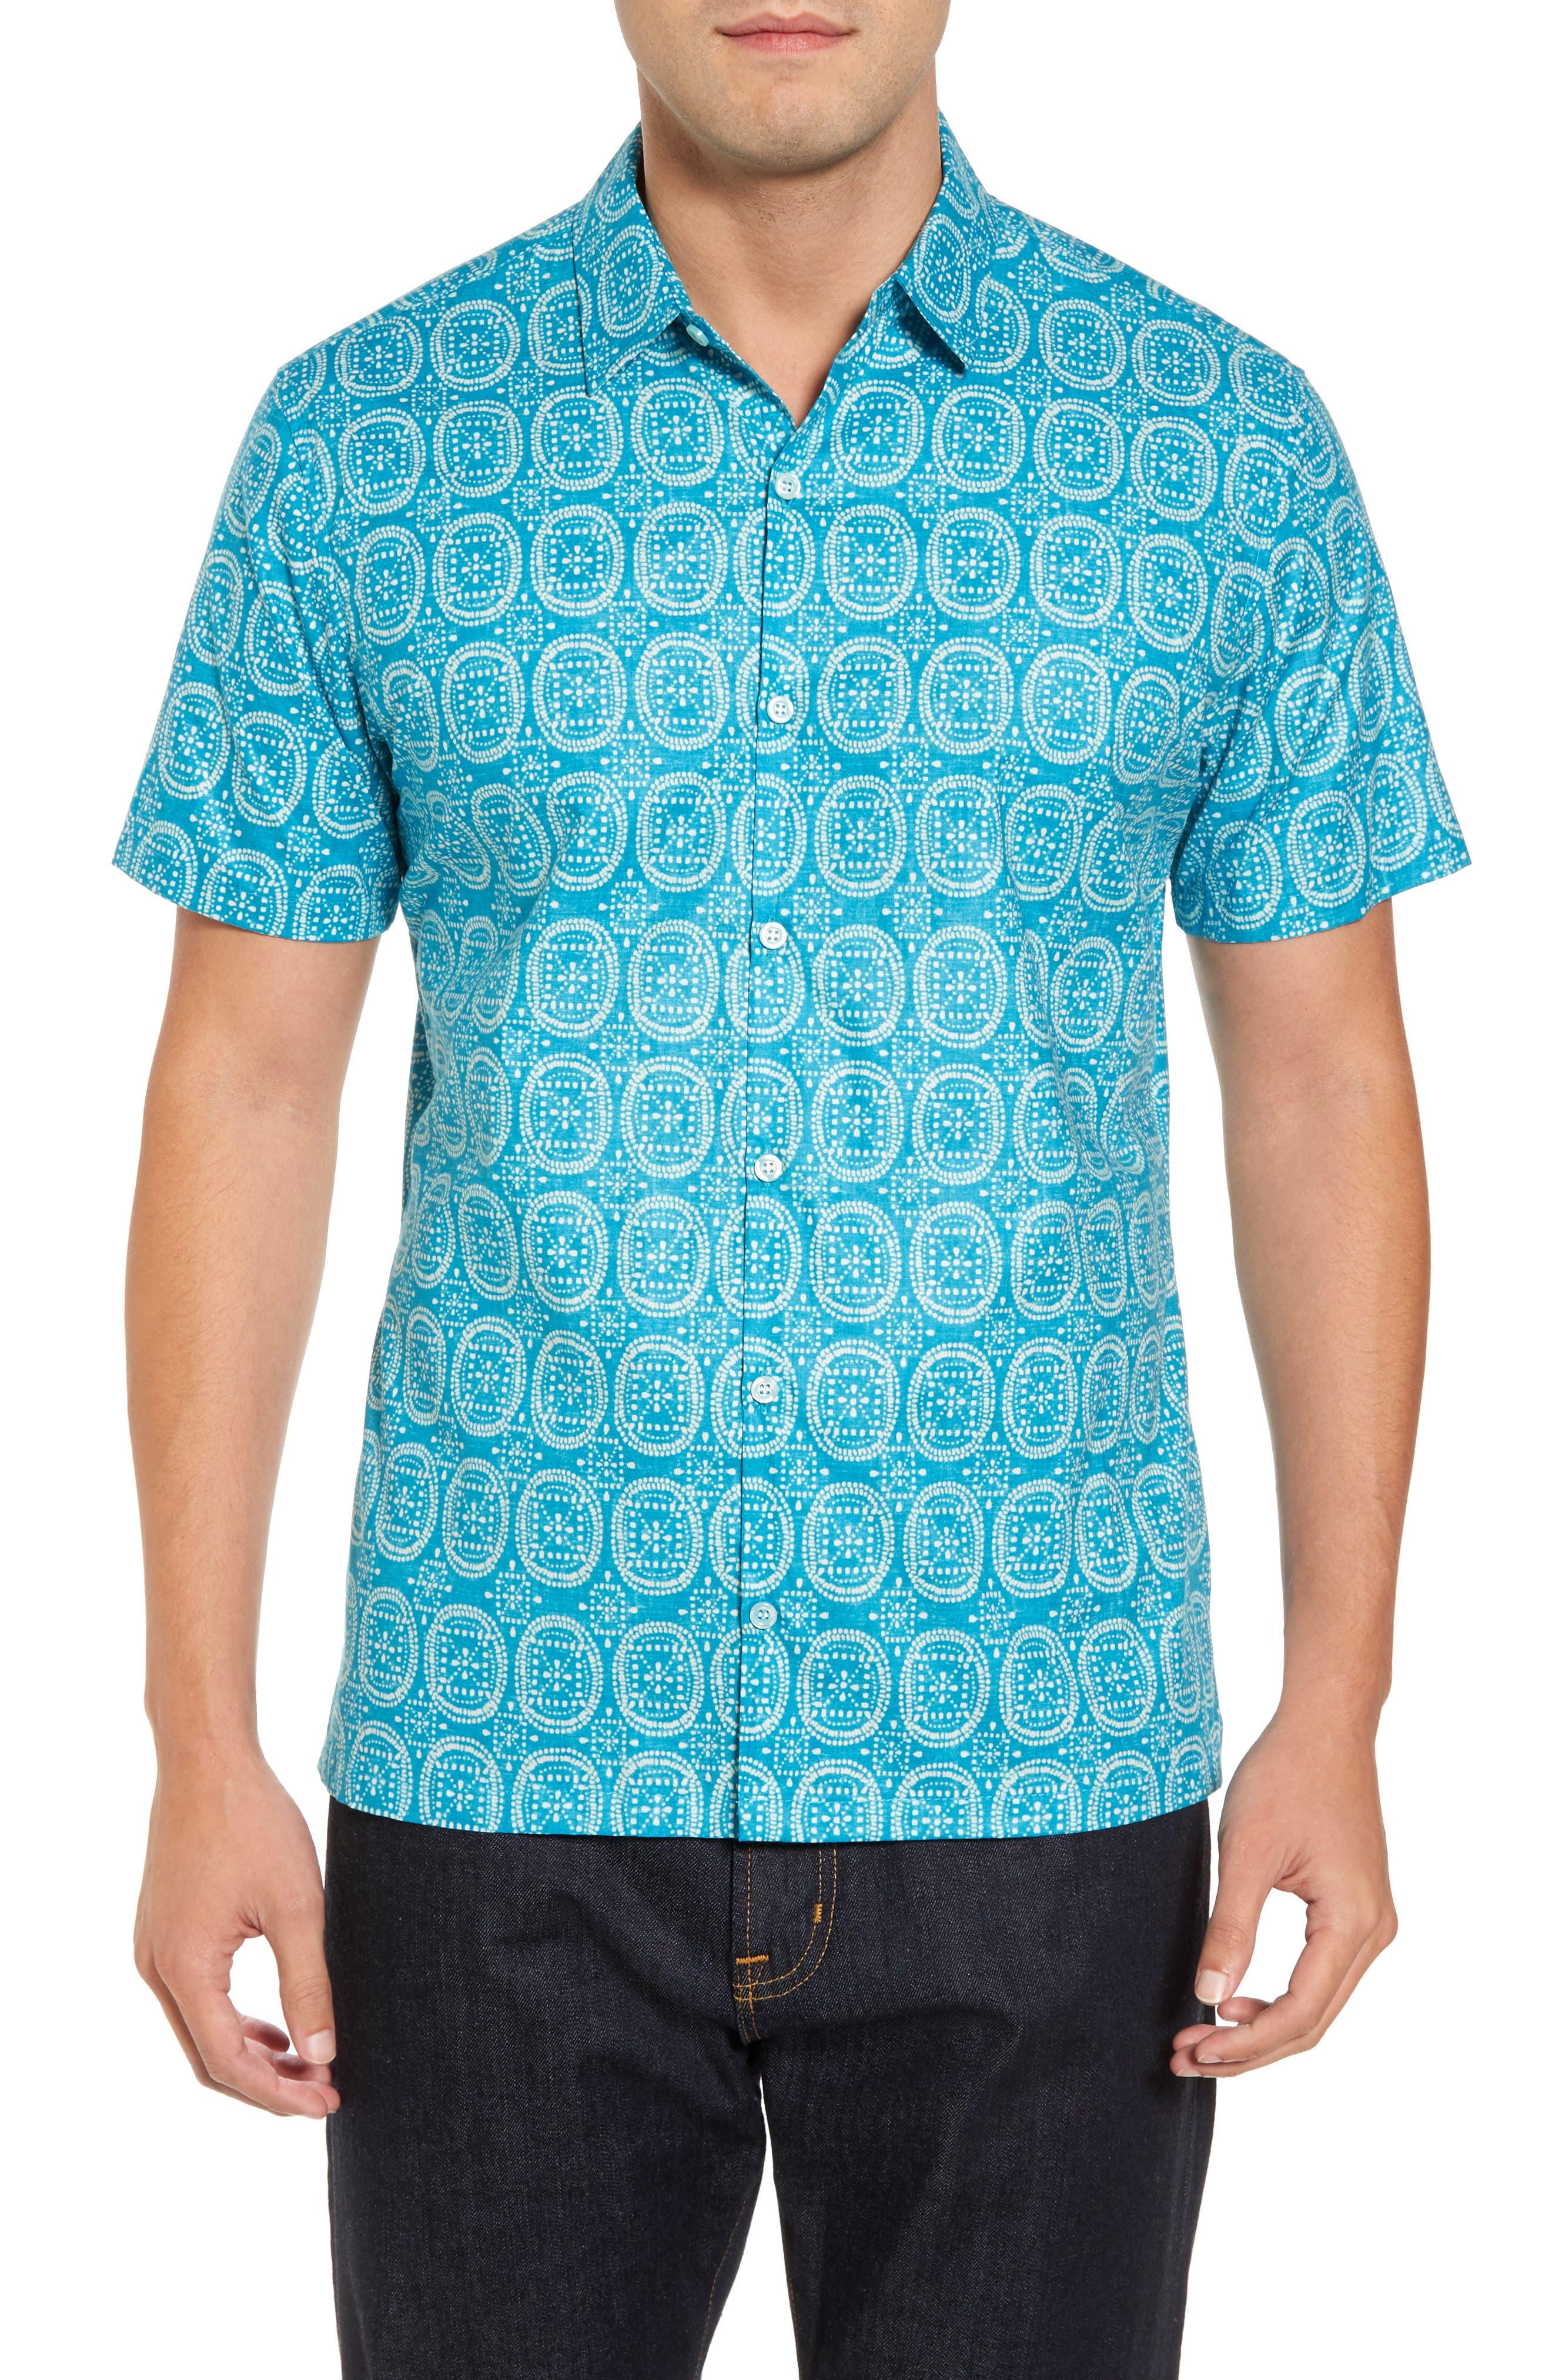 Sea Biscuits Trim Fit Print Sport Shirt,                             Main thumbnail 1, color,                             470